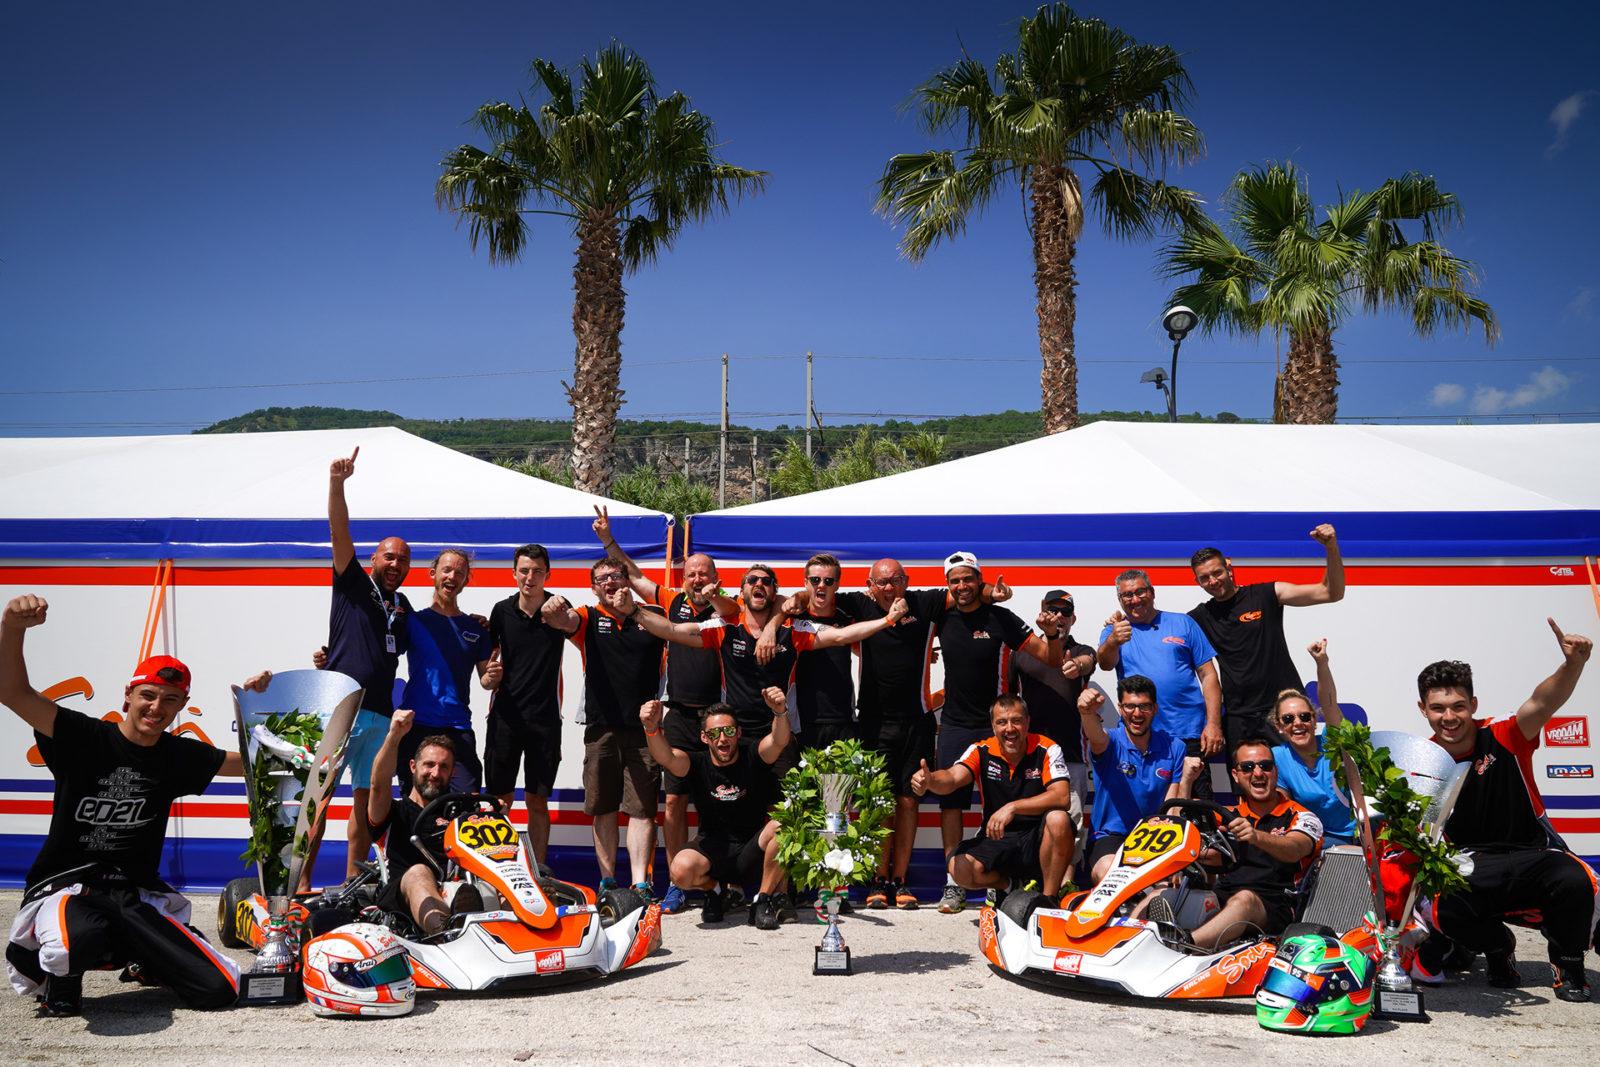 CPB Sodi Kart team celebration